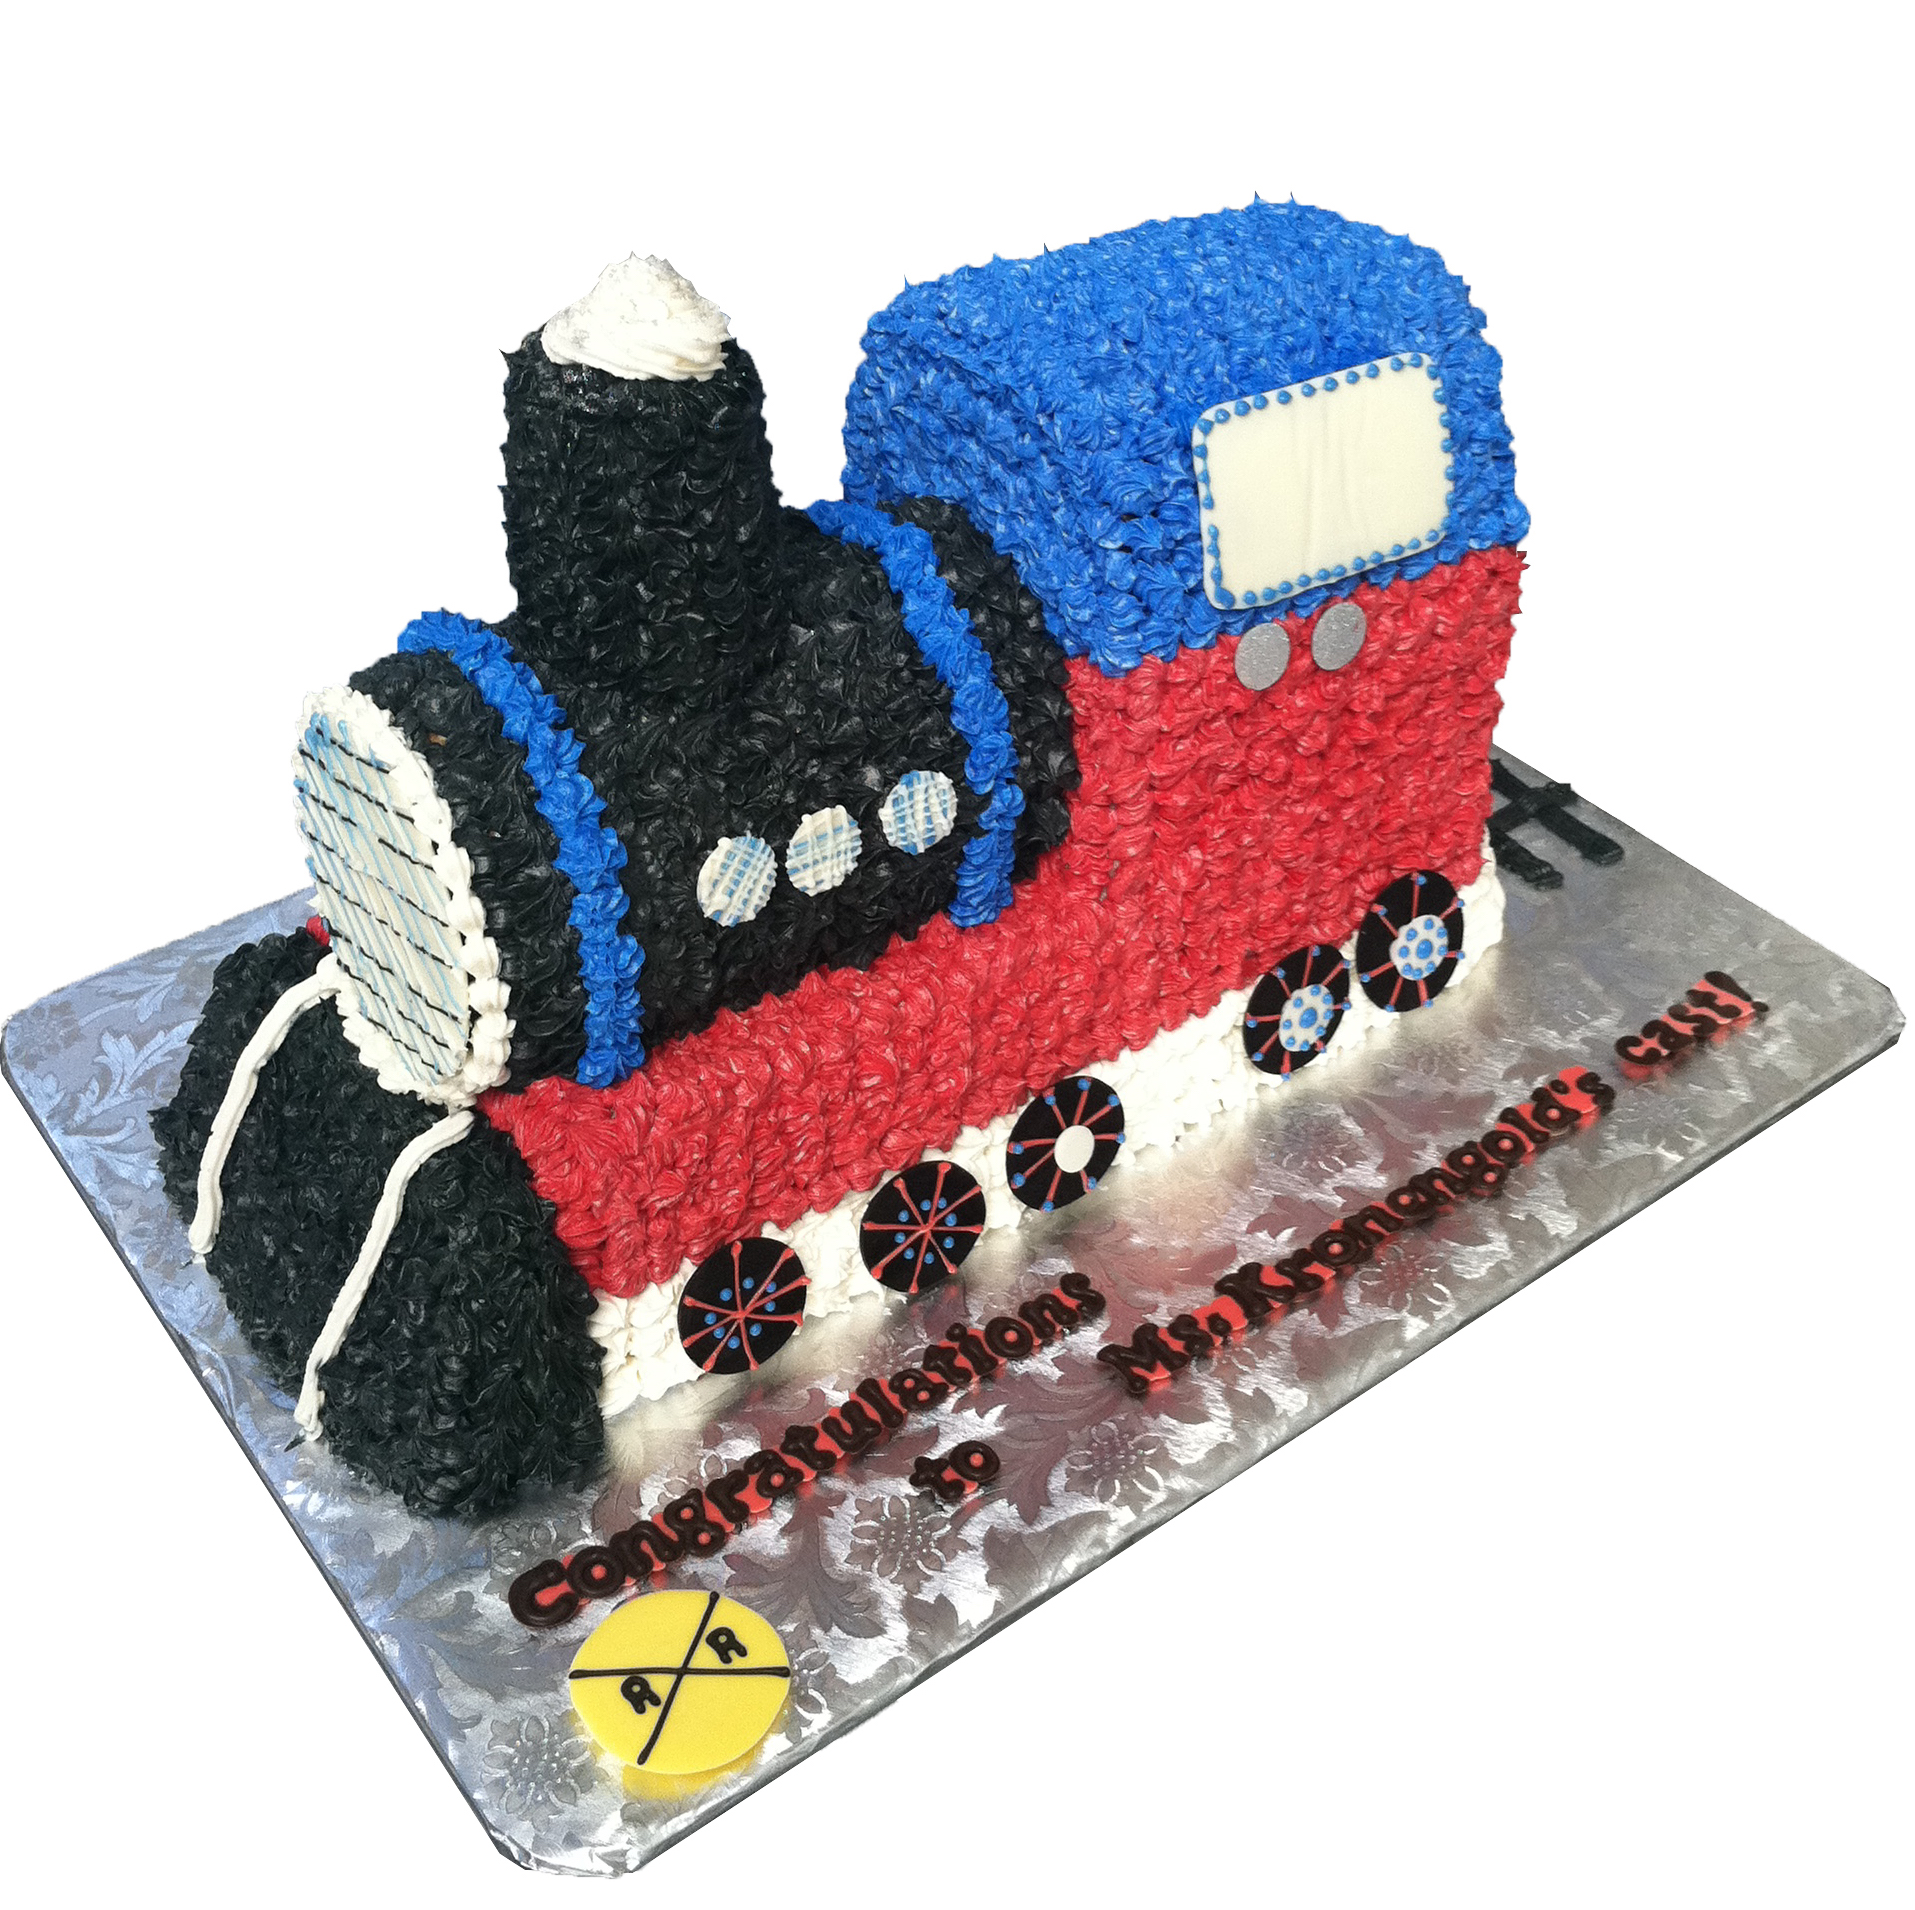 BeBe-Cakes-Vehicle-Train-Cake.JPG